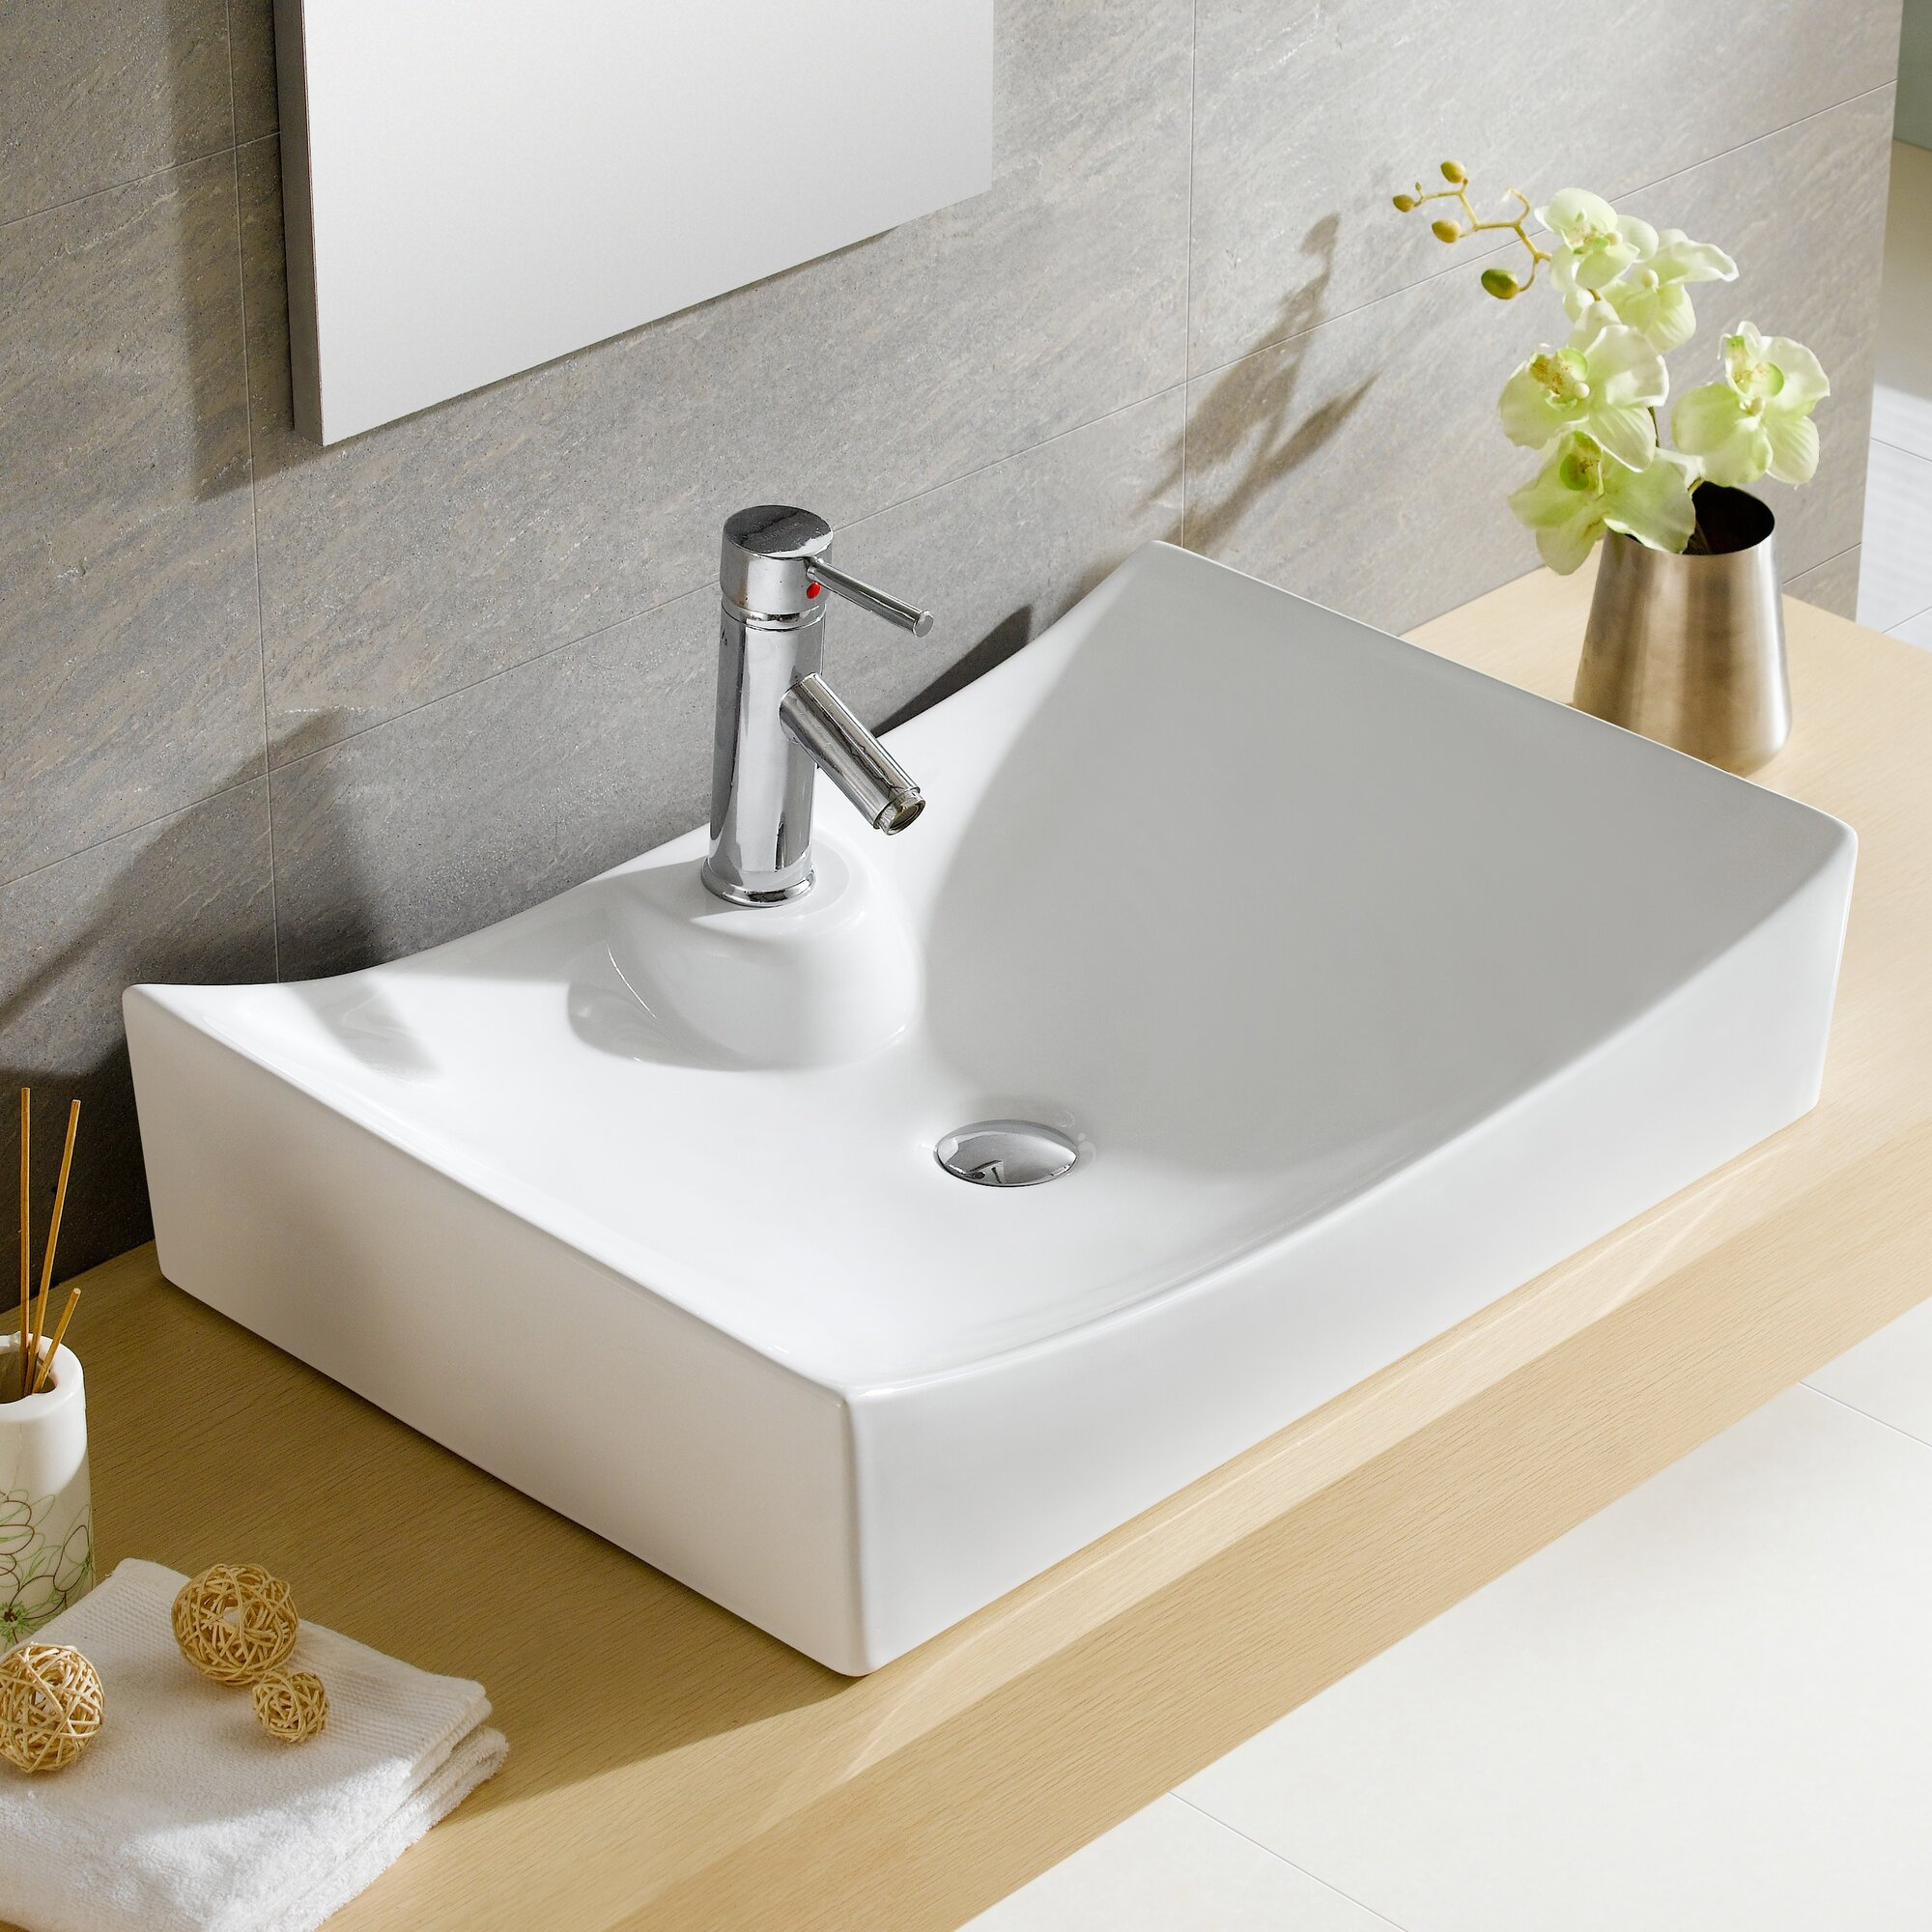 Fine Fixtures Modern Vitreous Bulging Square Vessel Bathroom Sink